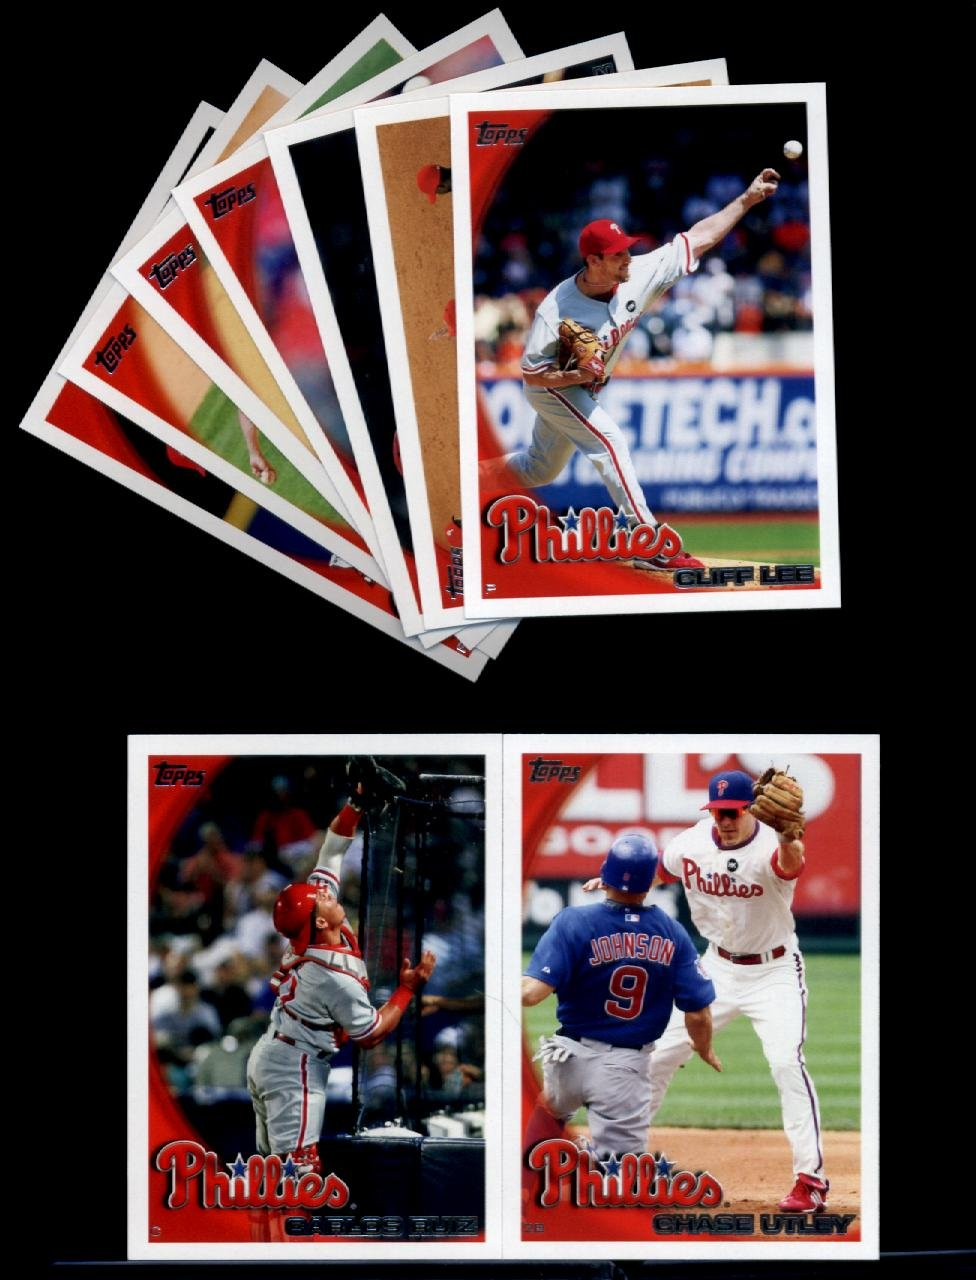 2010 Topps Baseball Cards Complete TEAM SET: Philadelphia Phillies (Series 1 & 2) 19 Cards including Utley, Howard, Victorino, Hamels, Ruiz, lee, Feliz,Werth, Rollins, Ibanez, Blanton & more!